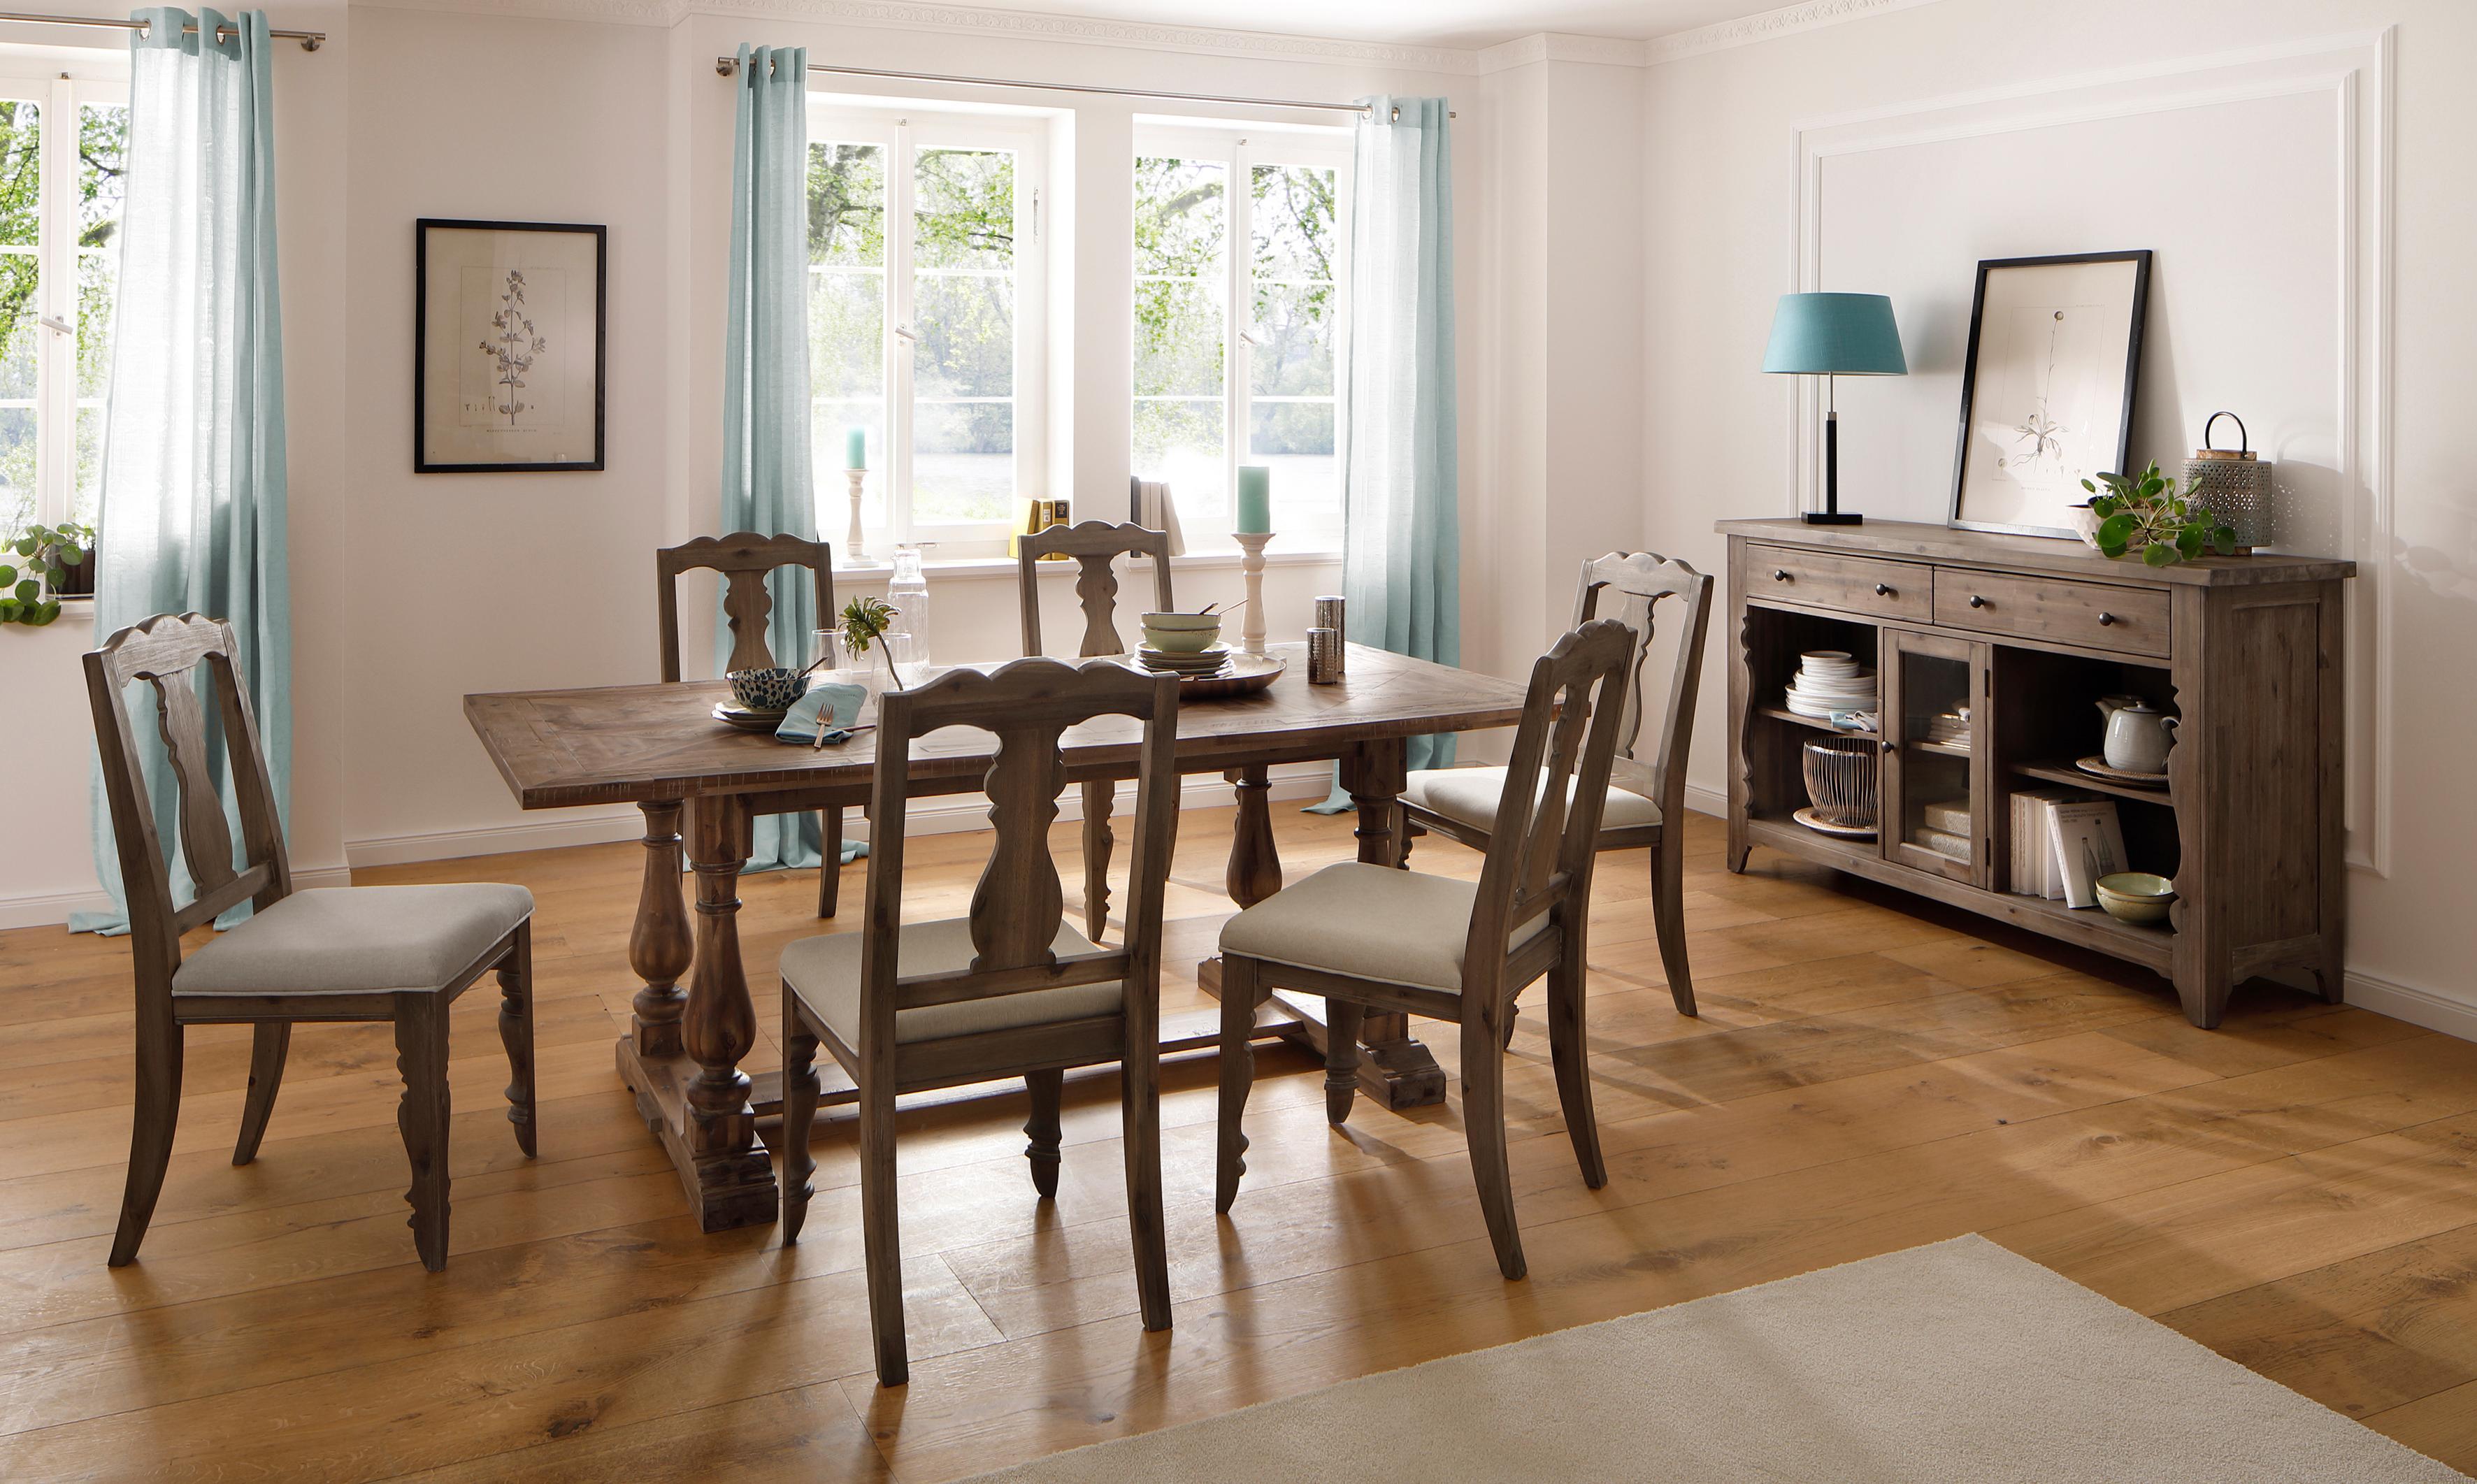 Home affaire Sideboard Magnolia im rustikalem Flair aus massivem Akazienholz